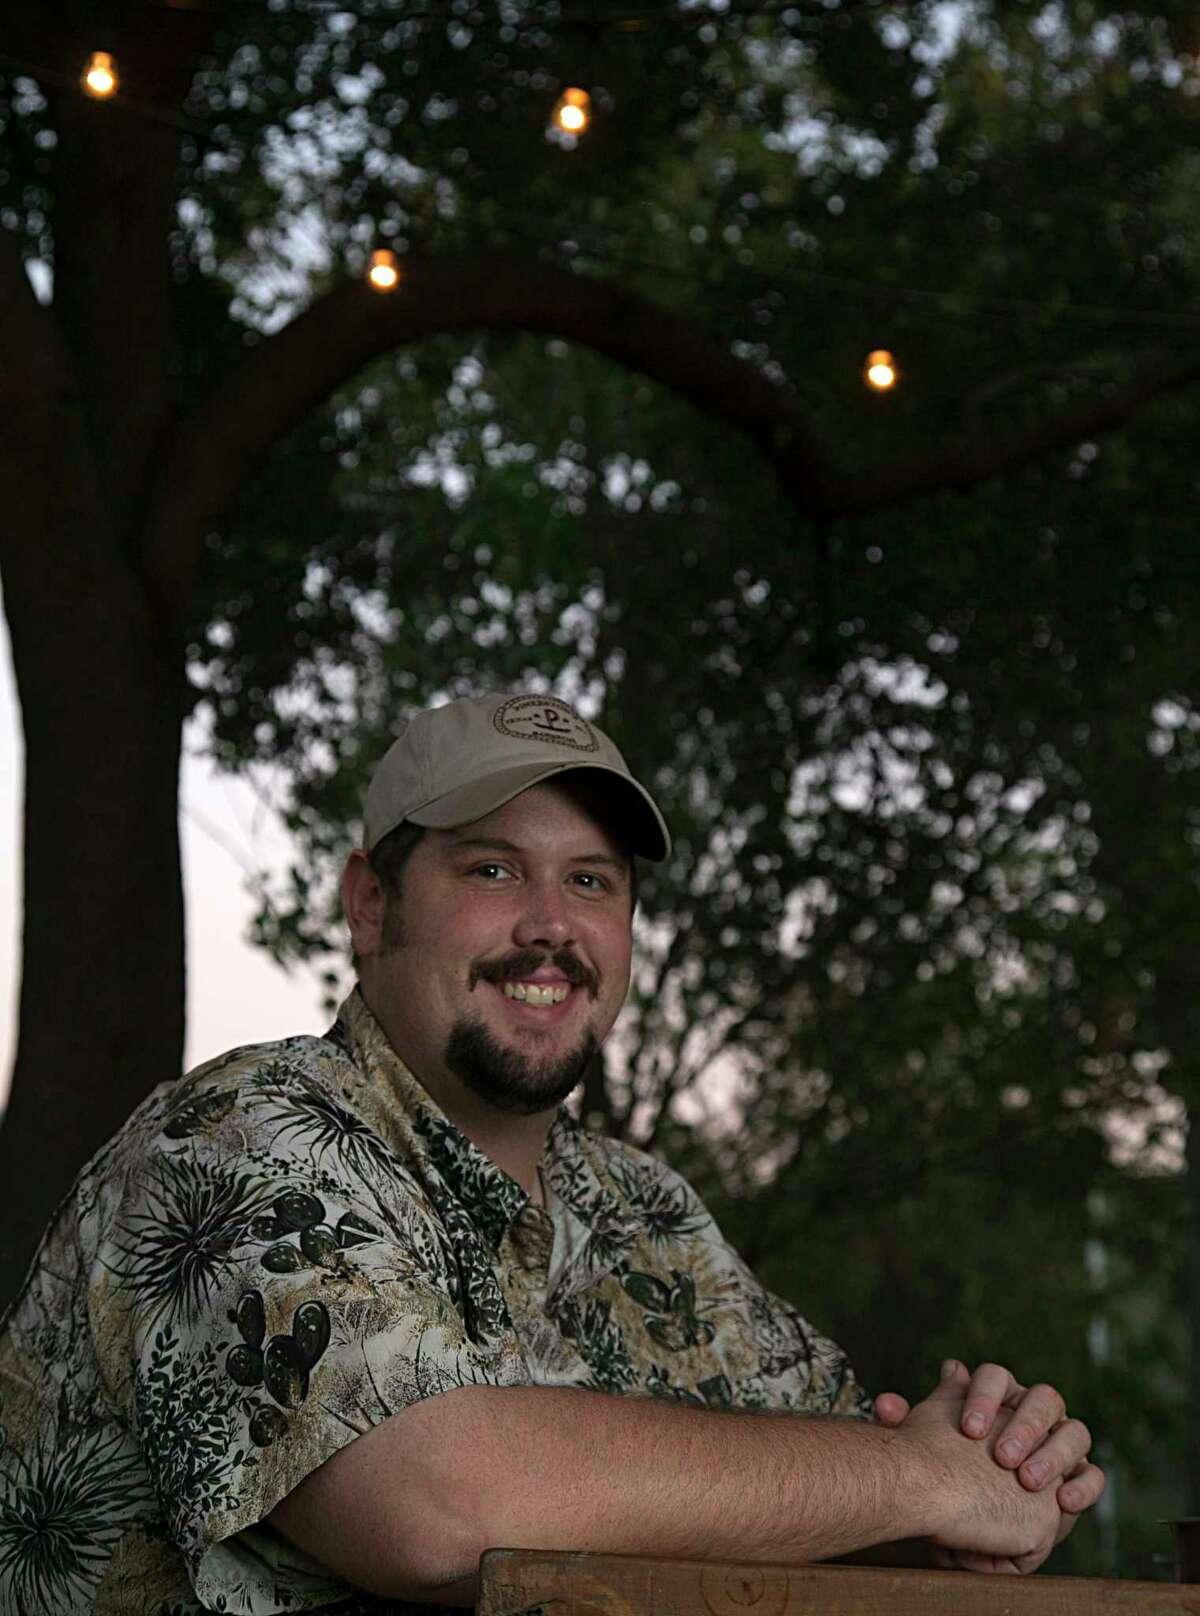 Pinkerton's Barbecue owner Grant Pinkerton